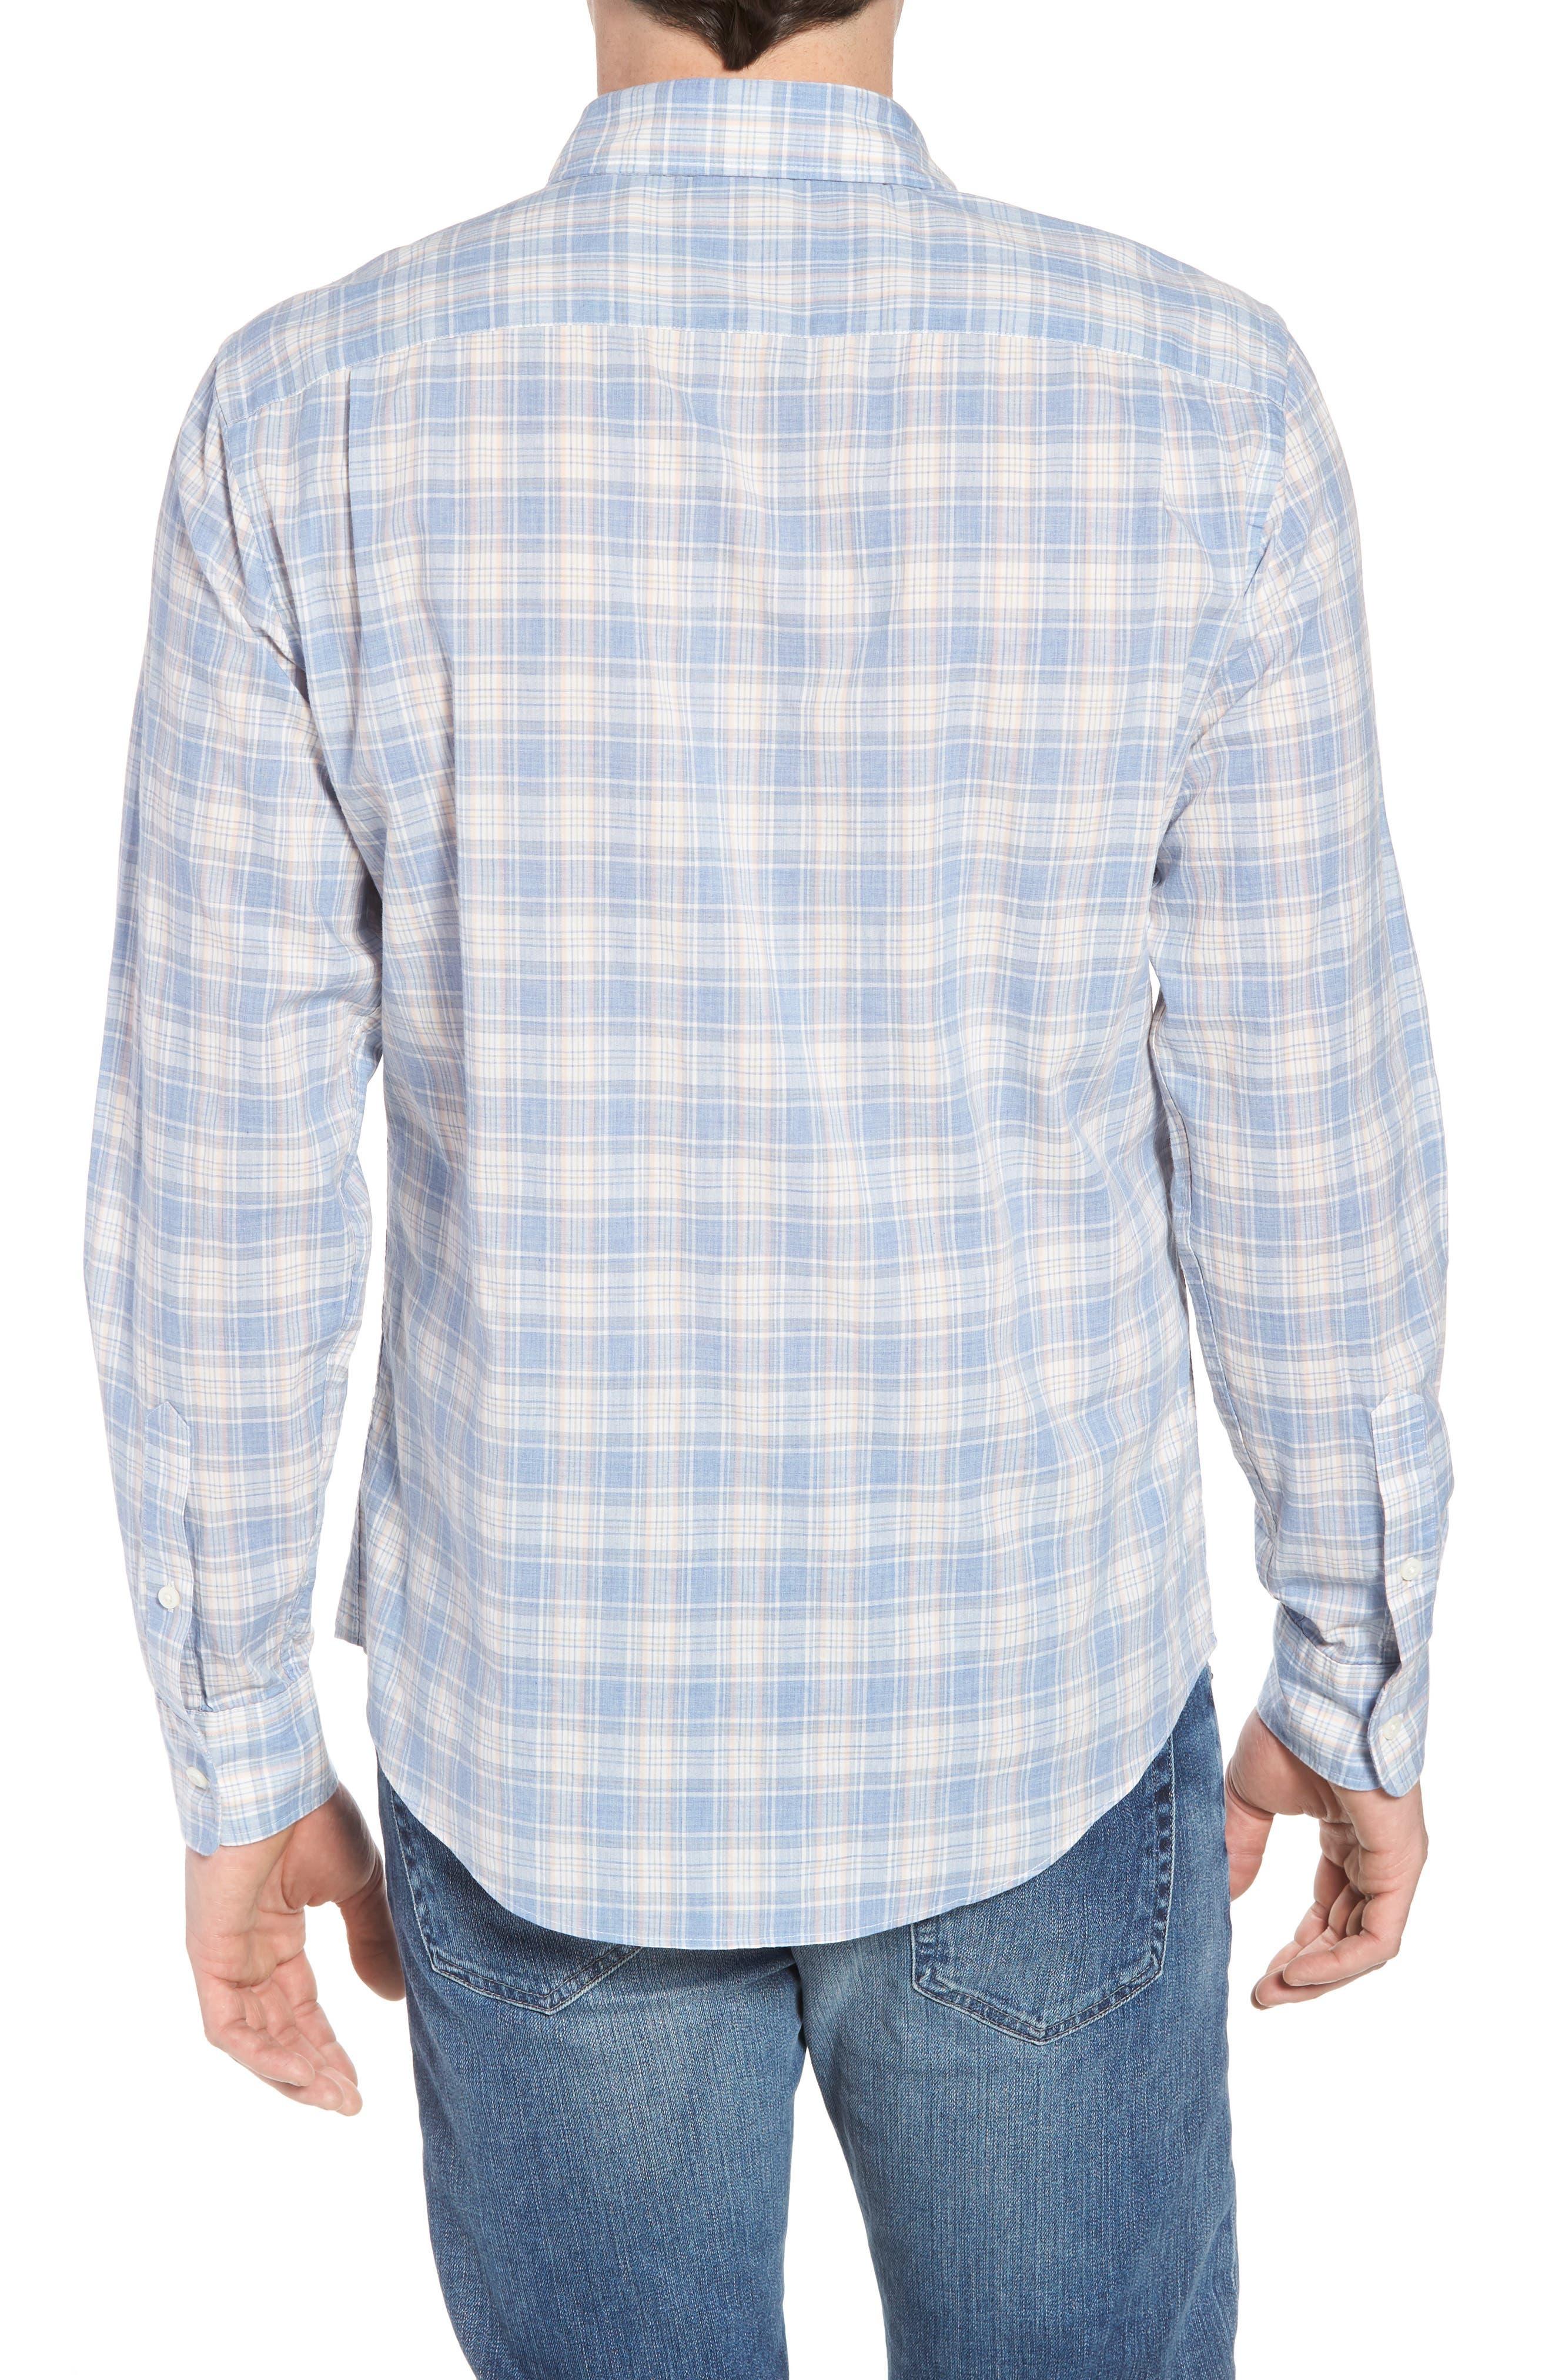 Ventura Plaid Sport Shirt,                             Alternate thumbnail 3, color,                             Blue Coral Grey